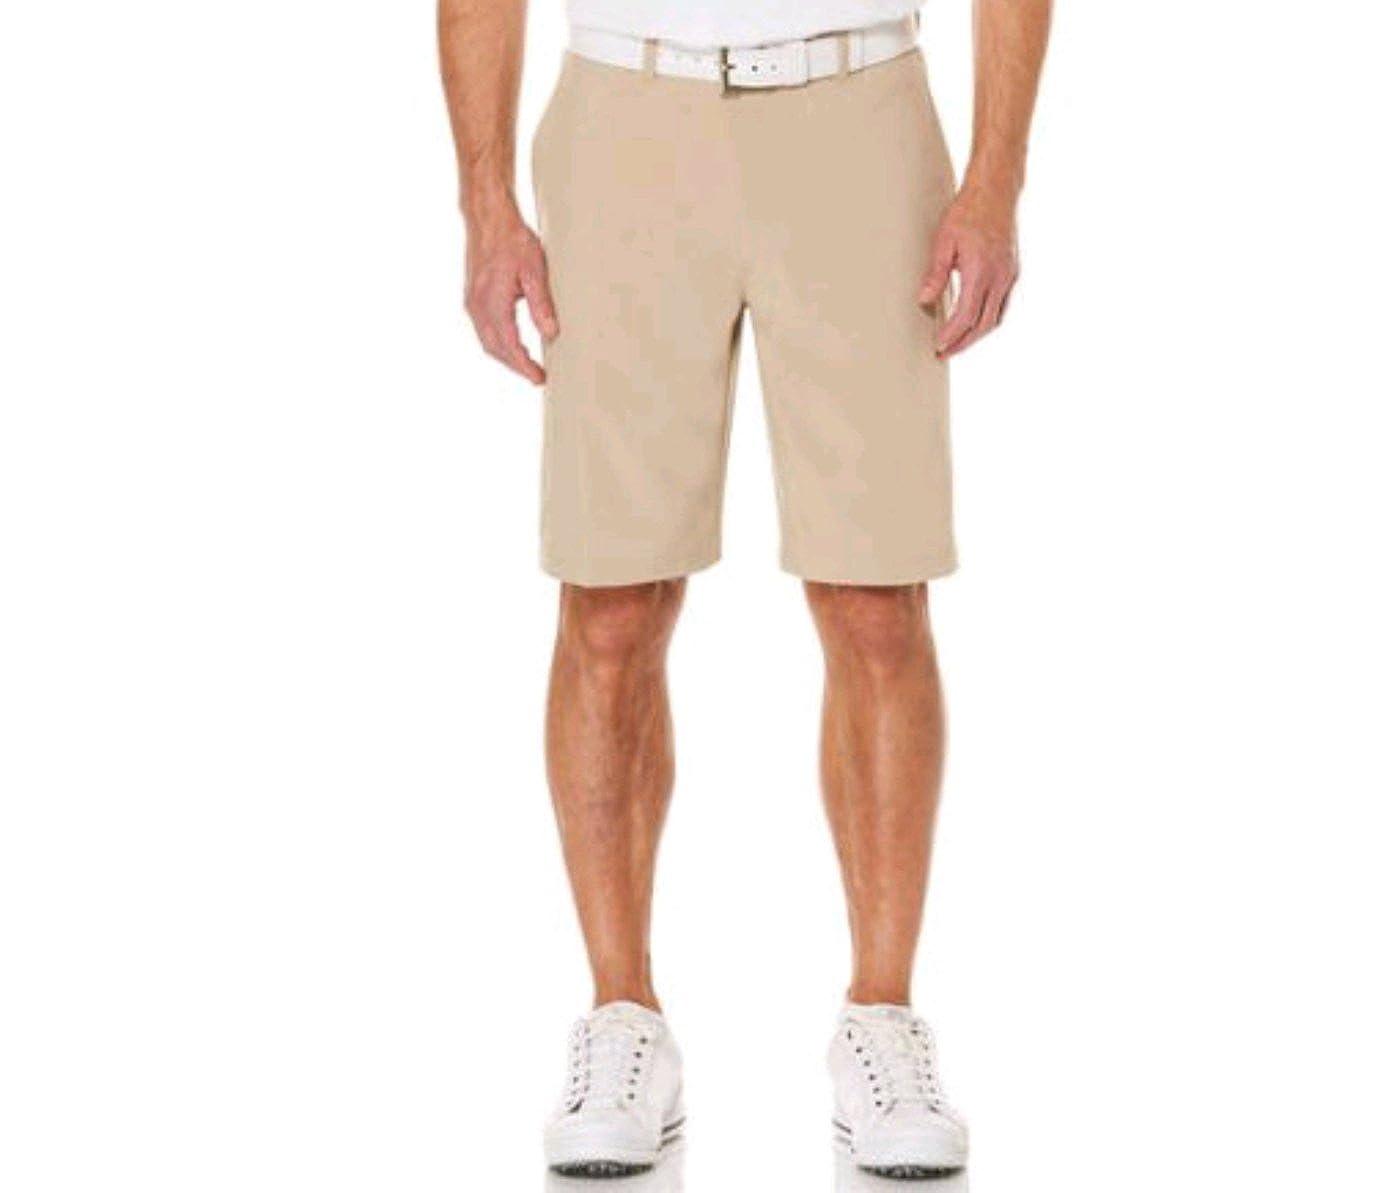 Ben Hogan Men's Performance Flat Front Active Flex Waistband Khaki Short